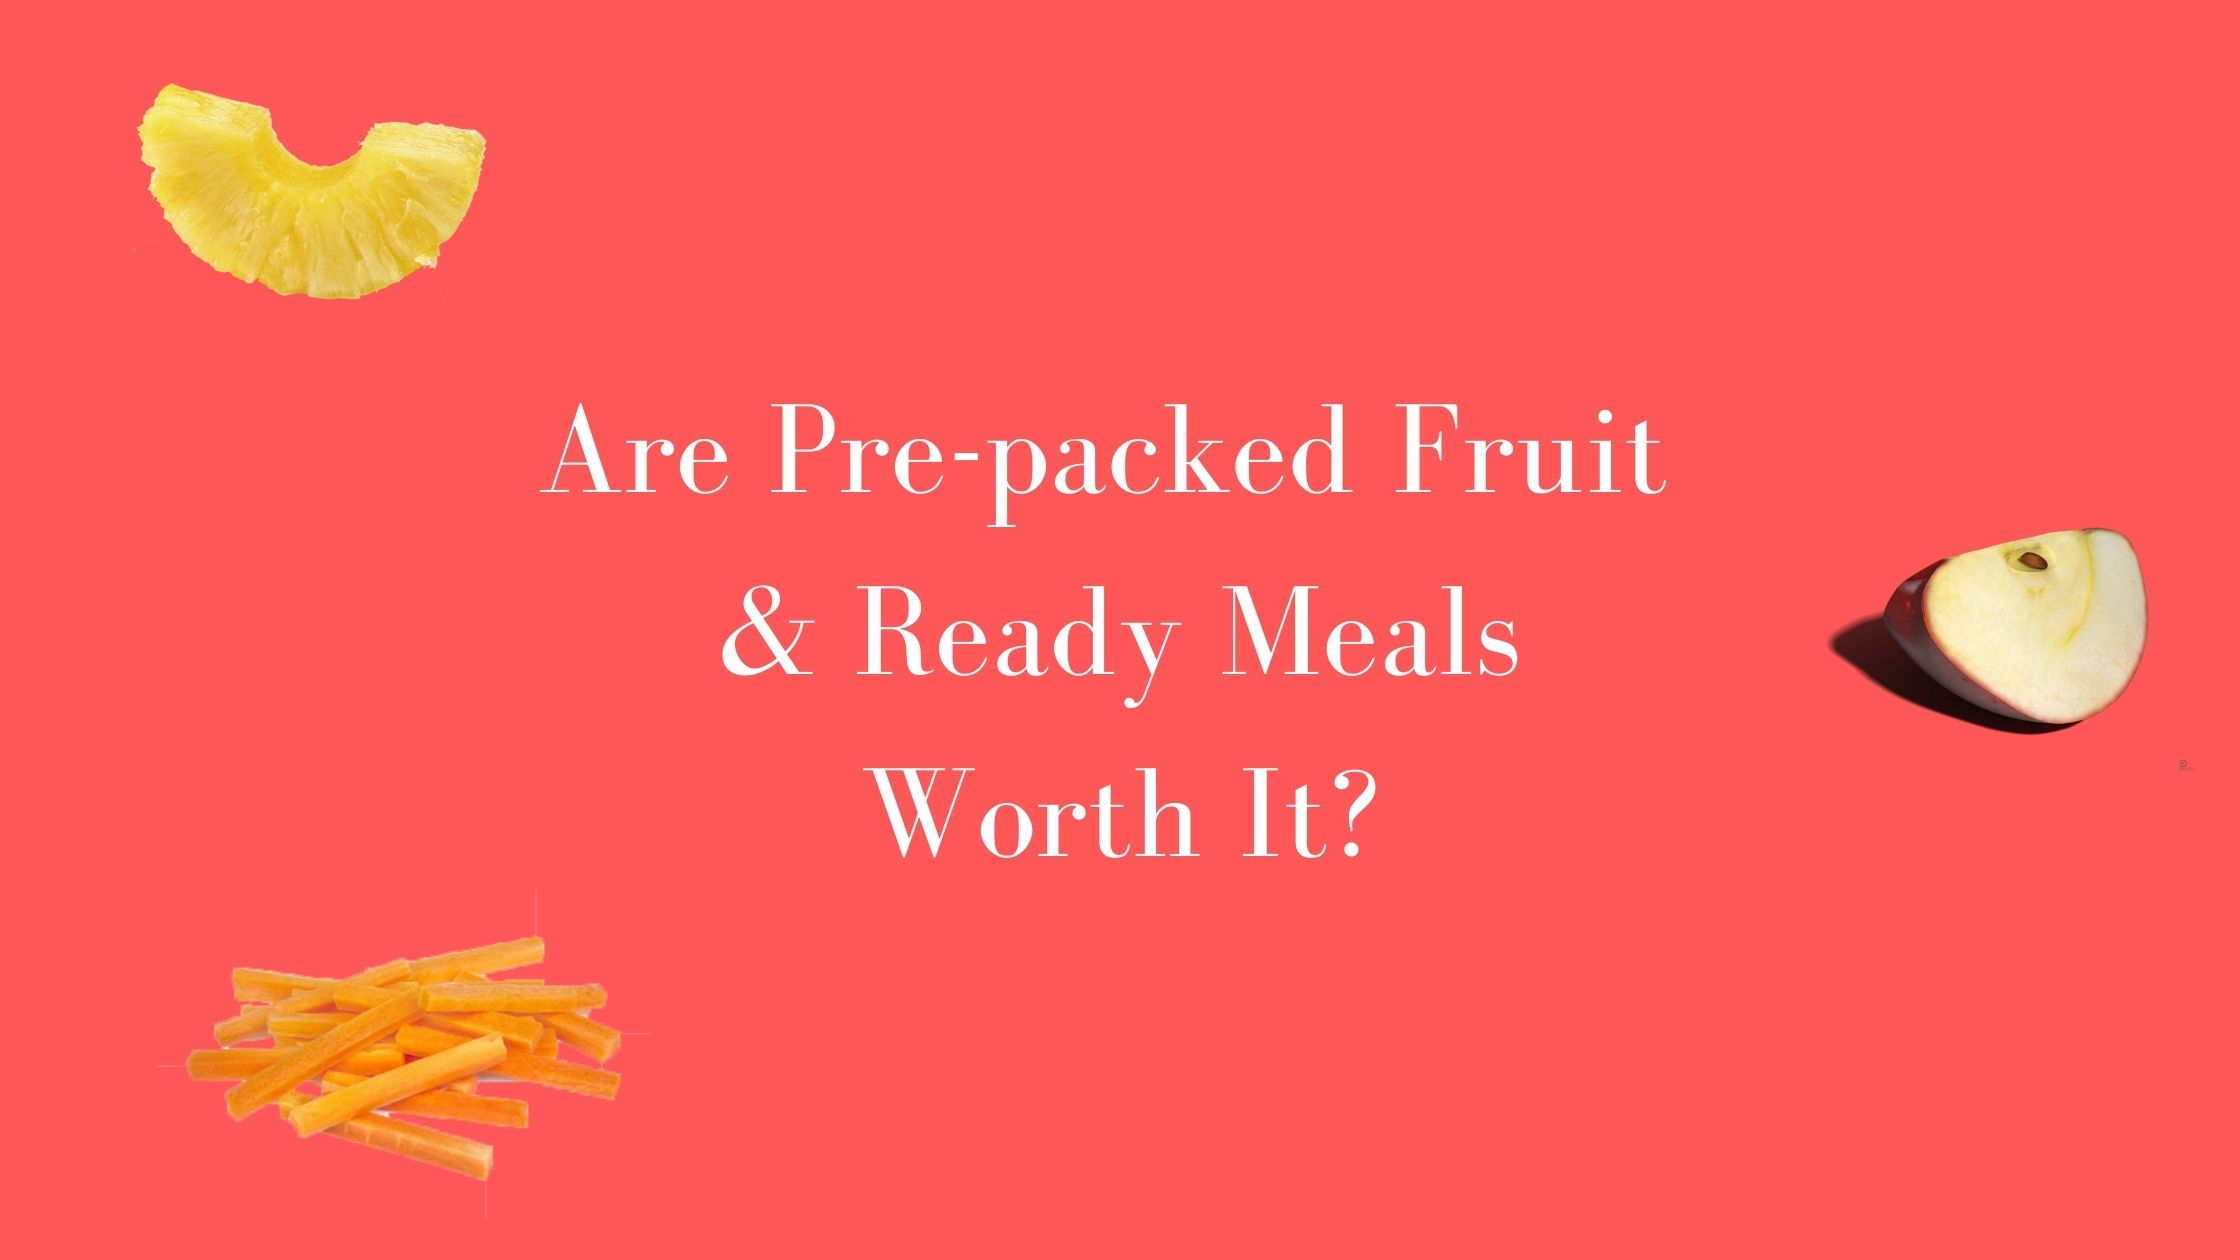 is prepacked fruit worth it?